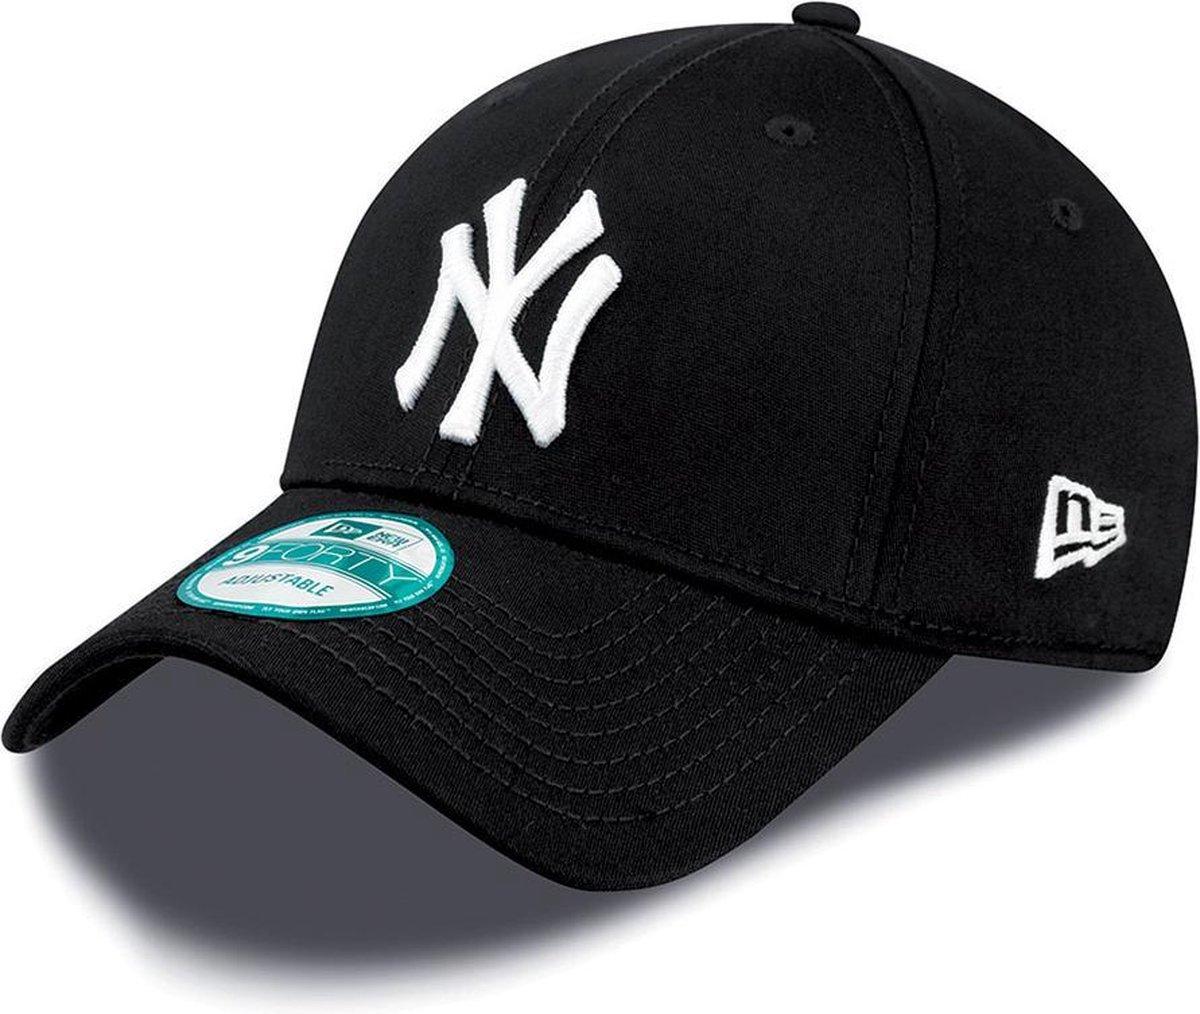 New Era 940 LEAG BASIC New York Yankees Cap - Black - One size